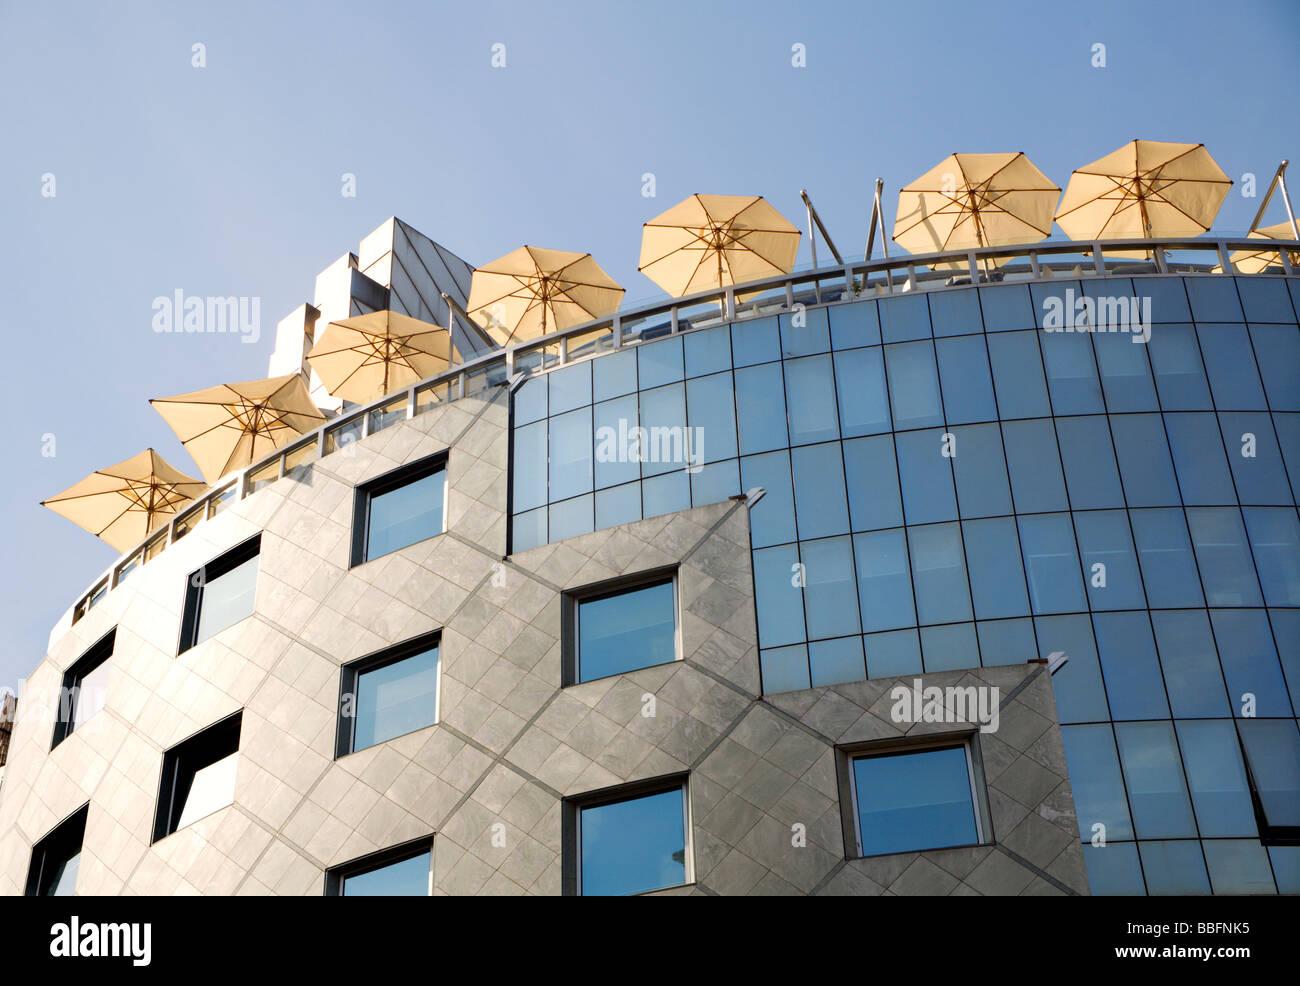 Vienne - l'architecture moderne Photo Stock